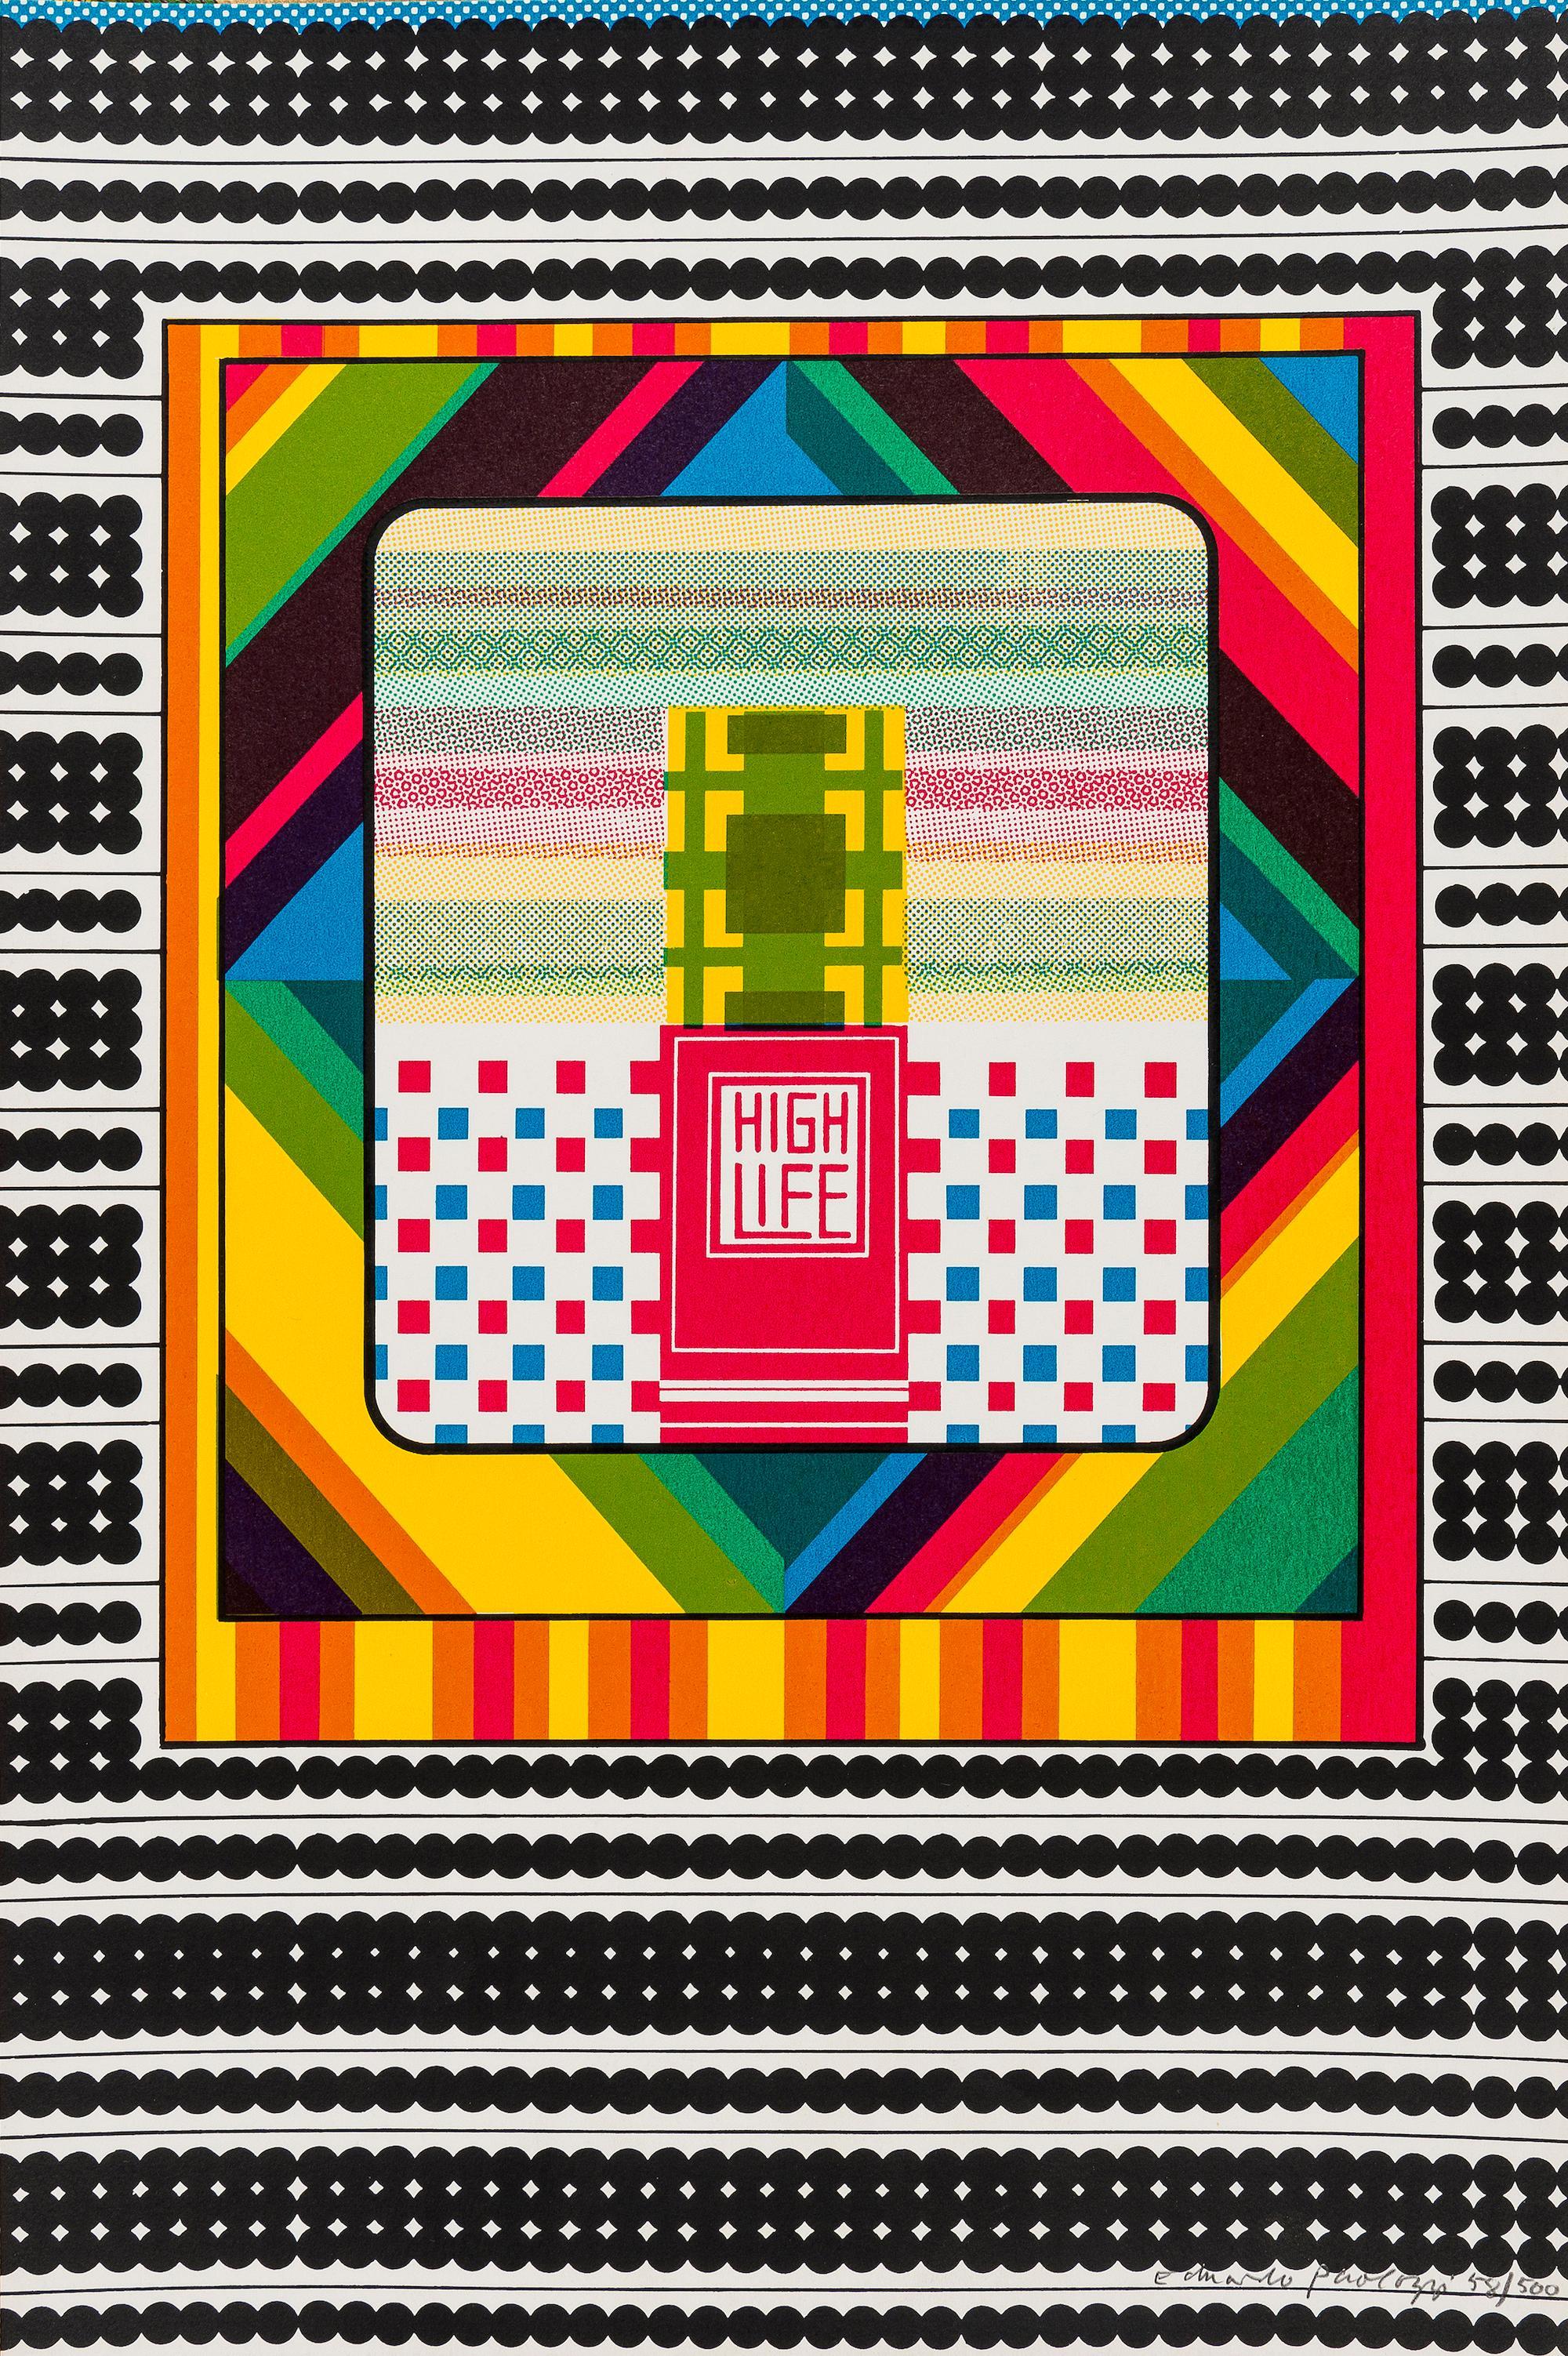 High Life -- Screen Print, Stripes, Patterns, Pop Art by Eduardo Paolozzi